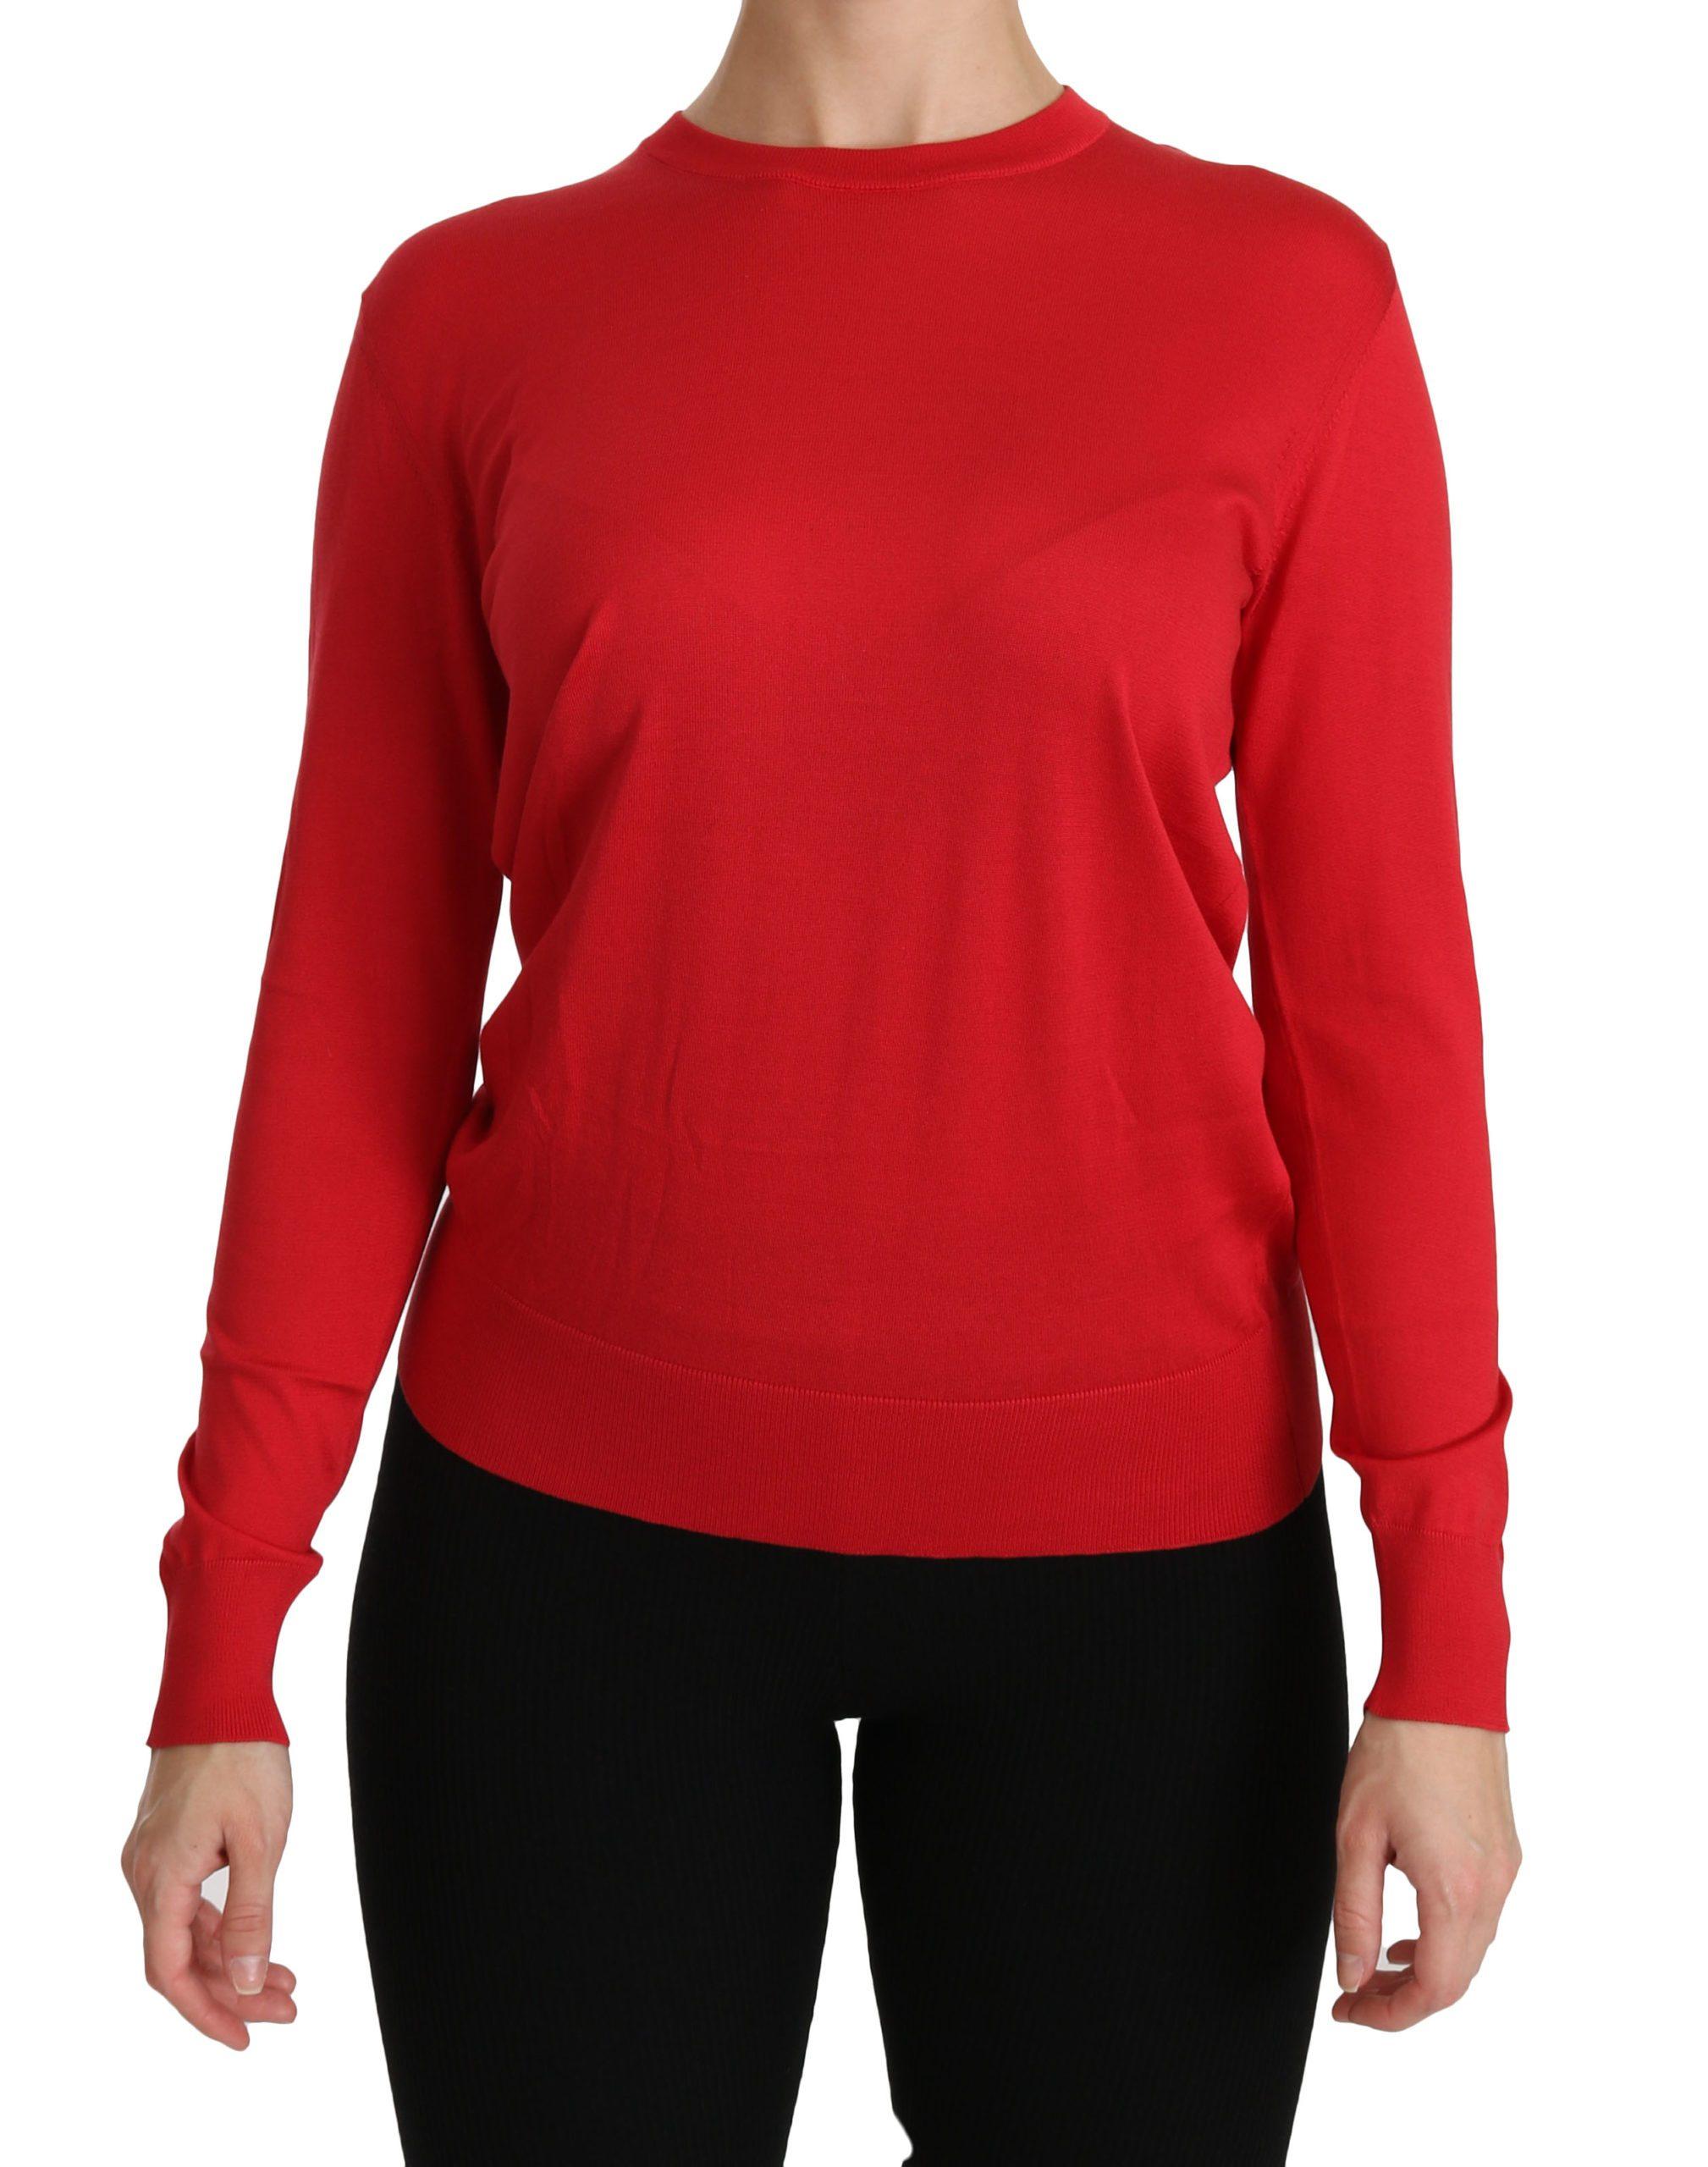 Dolce & Gabbana Women's Crewneck Pullover Silk Sweater Red TSH4247 - IT36 | XS